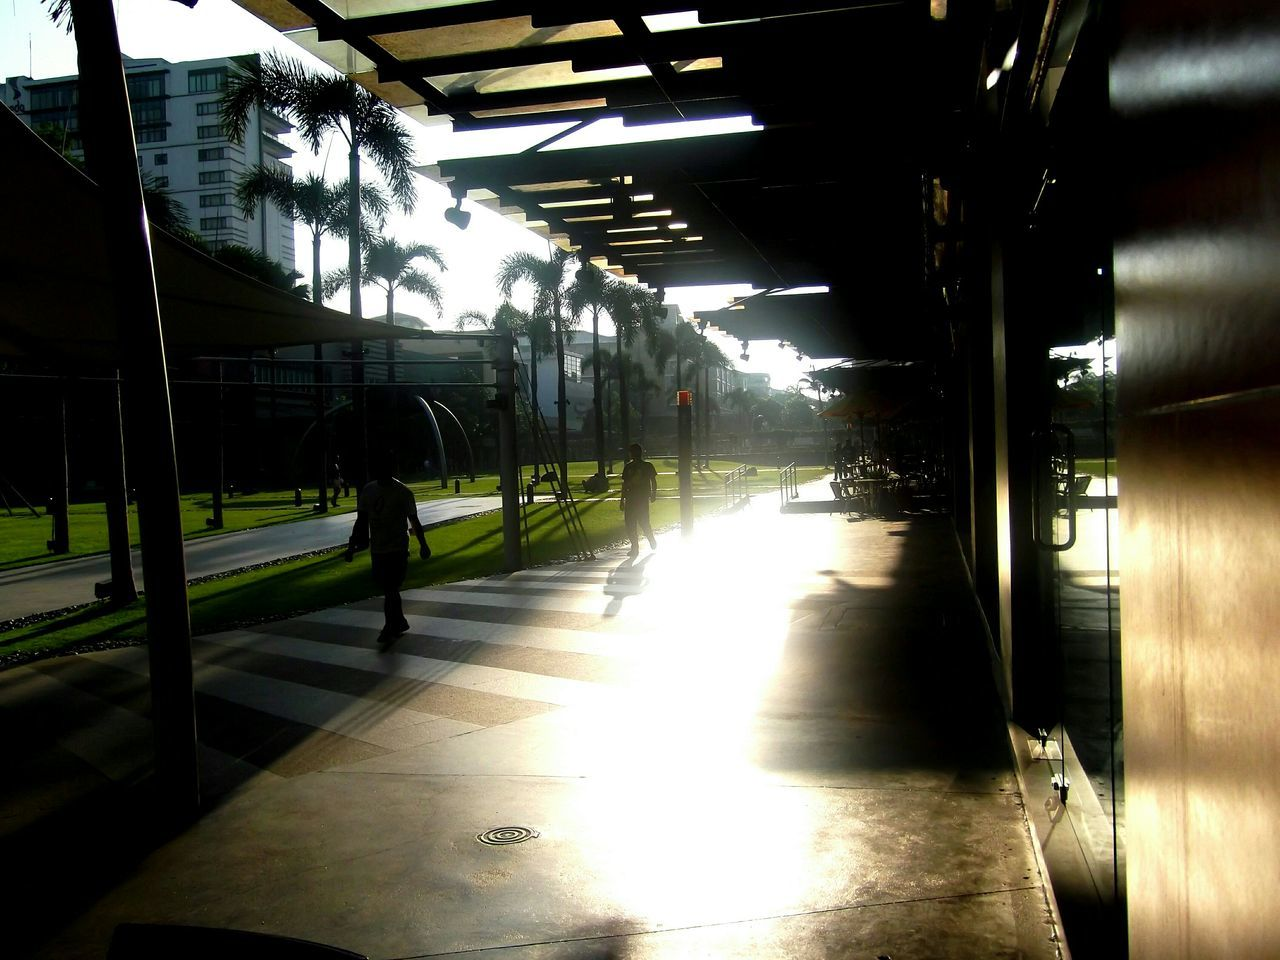 Popular Photos EyeEm Best Shots Getting Creative Taking Pictures Sunrise Urban Landscape BCG Eyeem Philippines